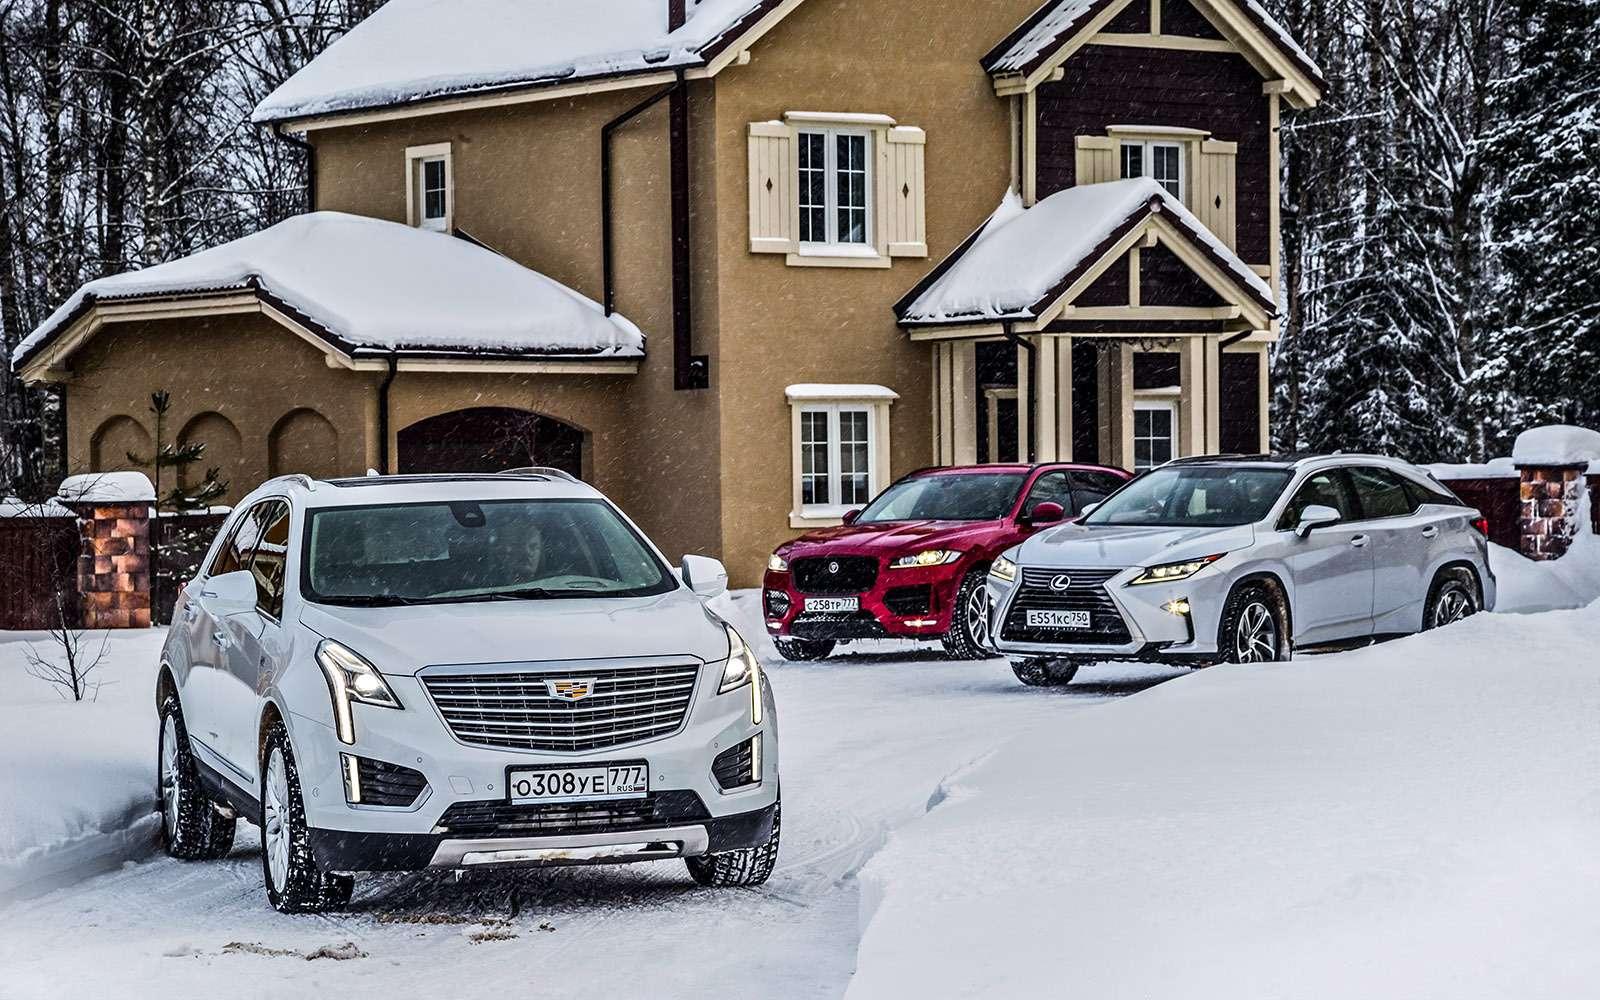 Тест премиум-кроссоверов: Lexus RX350, Cadillac XT5и Jaguar F-Pace— фото 721755